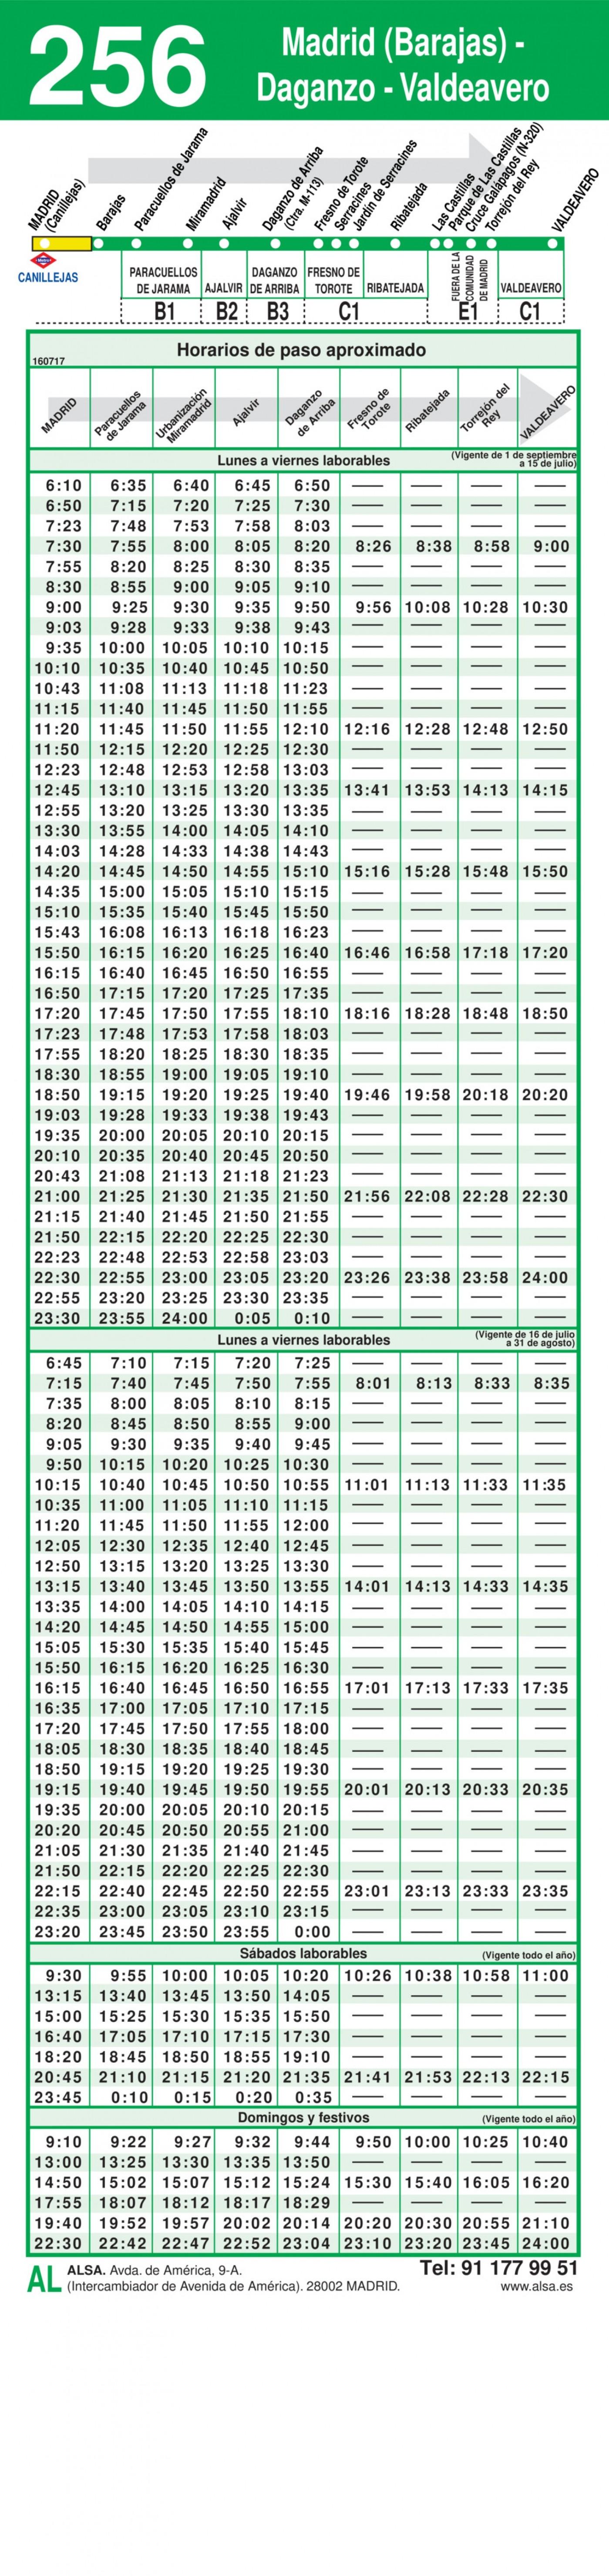 horario ida 256 madrid ajalvir valdeavero autobuses interurbanos